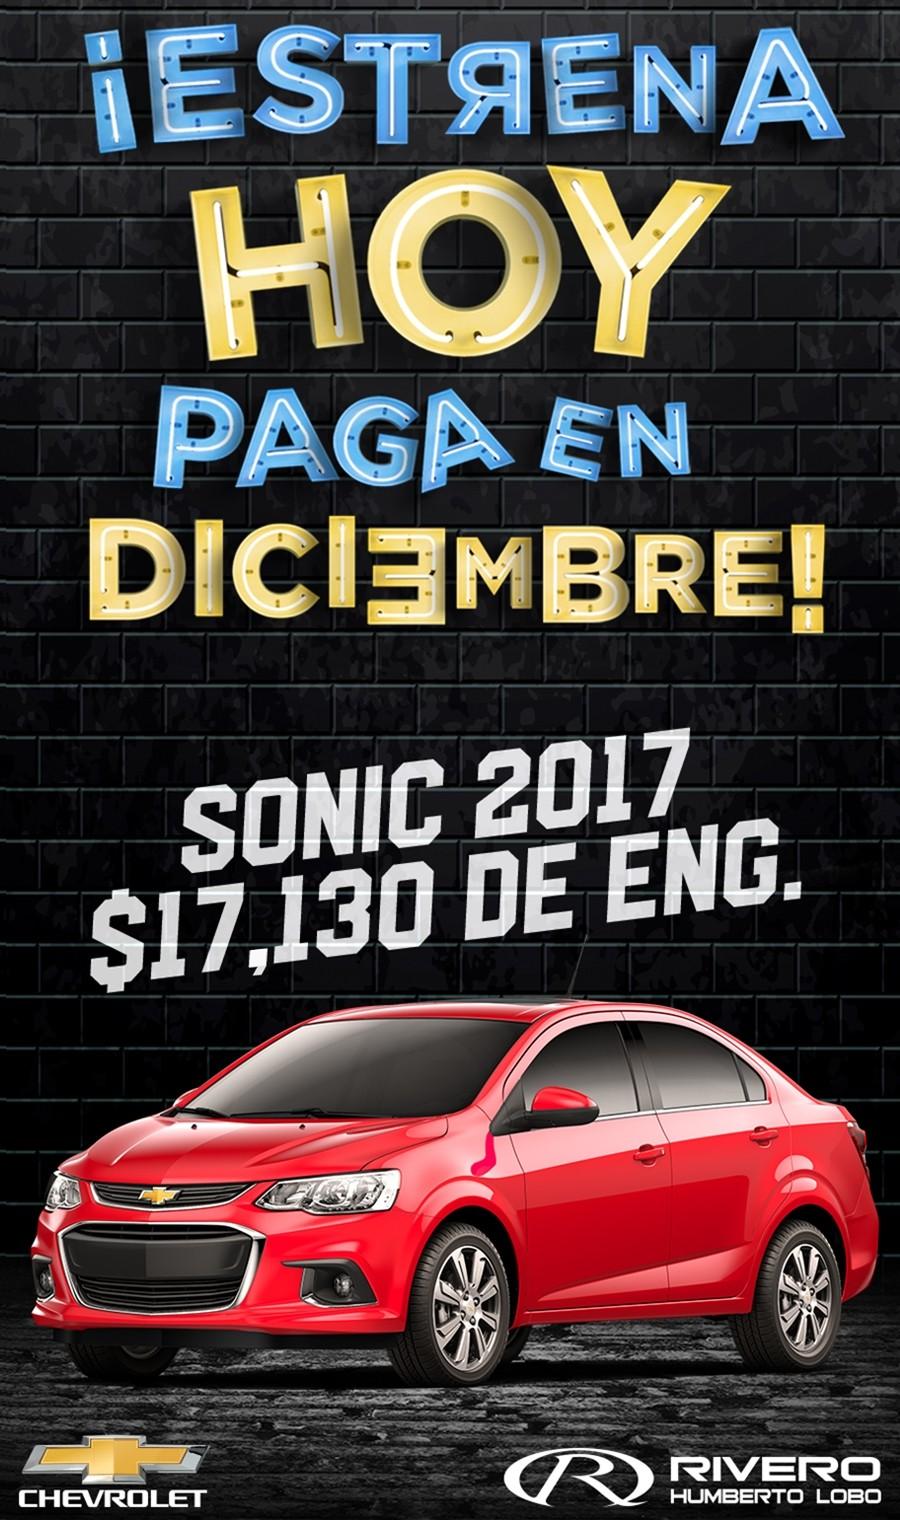 Chevrolet Grupo Rivero Sonic 2017 En Monterrey